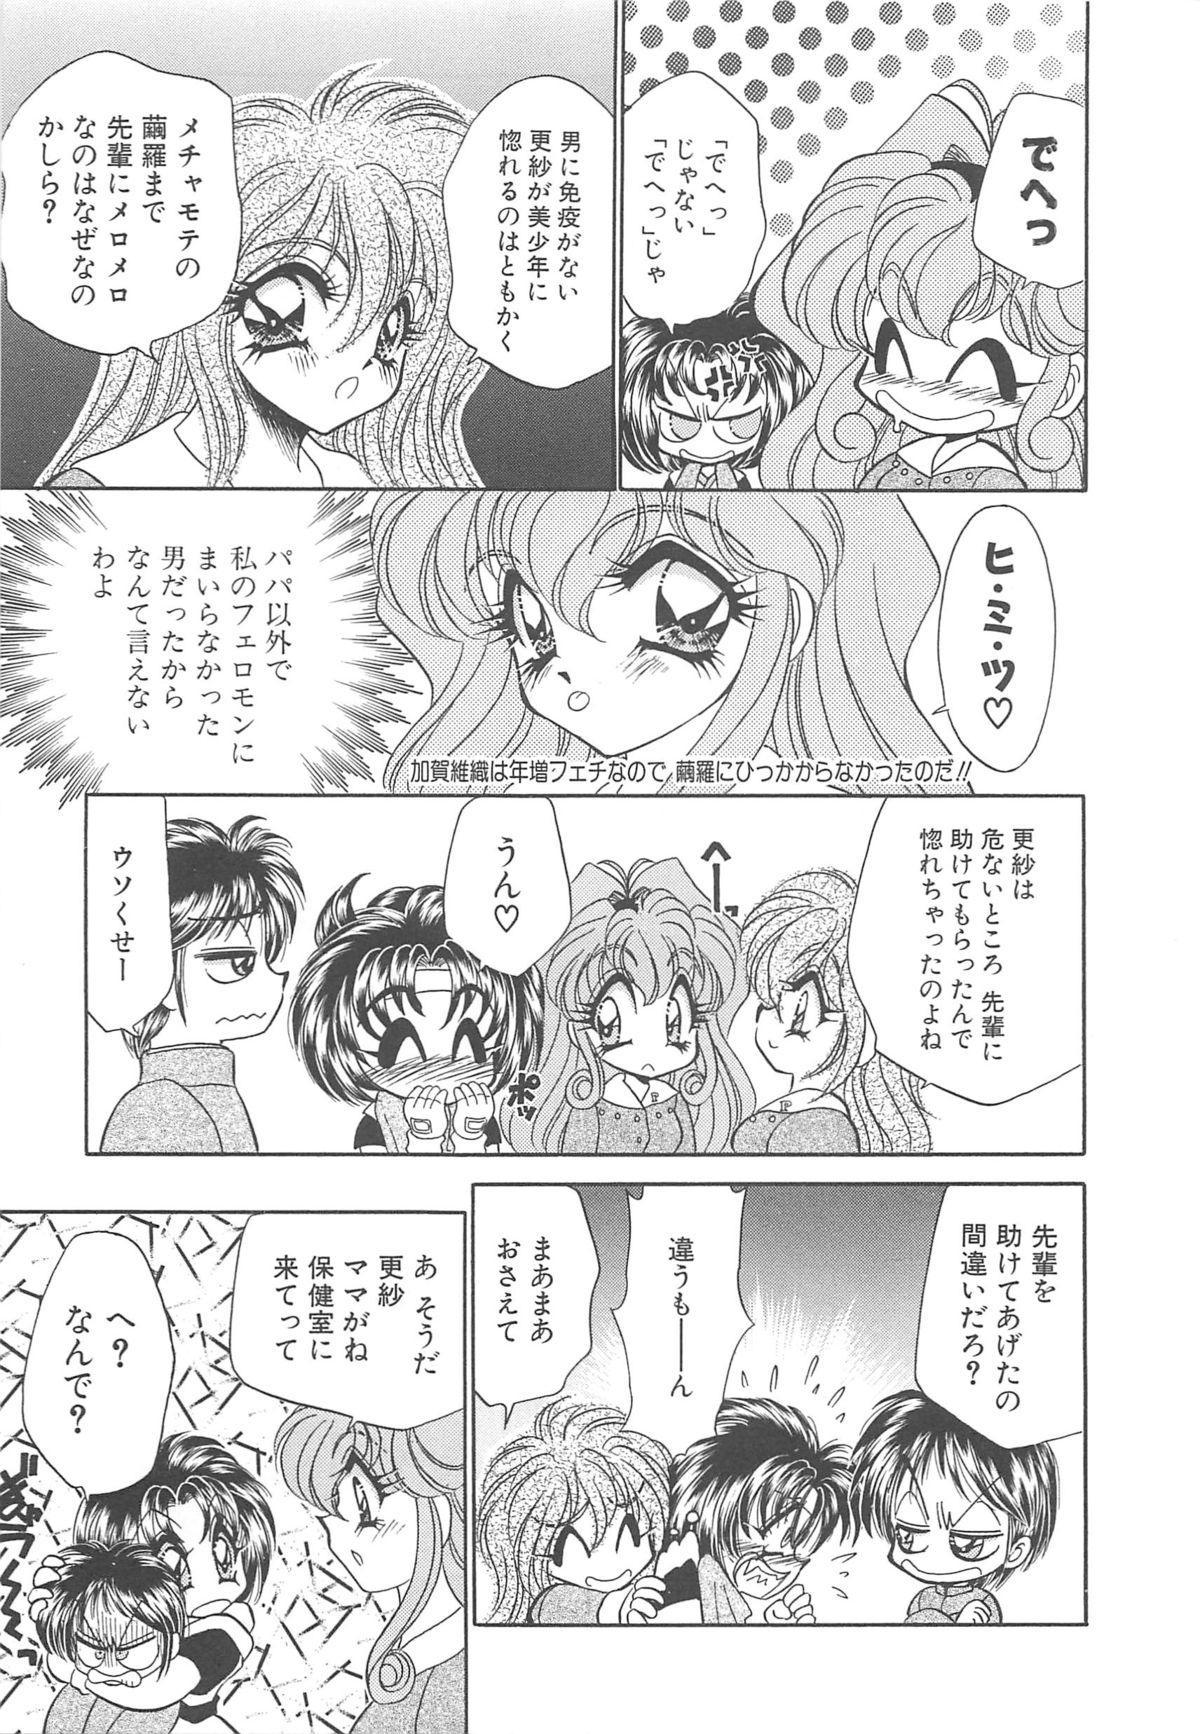 Kigurumi Sentai Quiltian 77